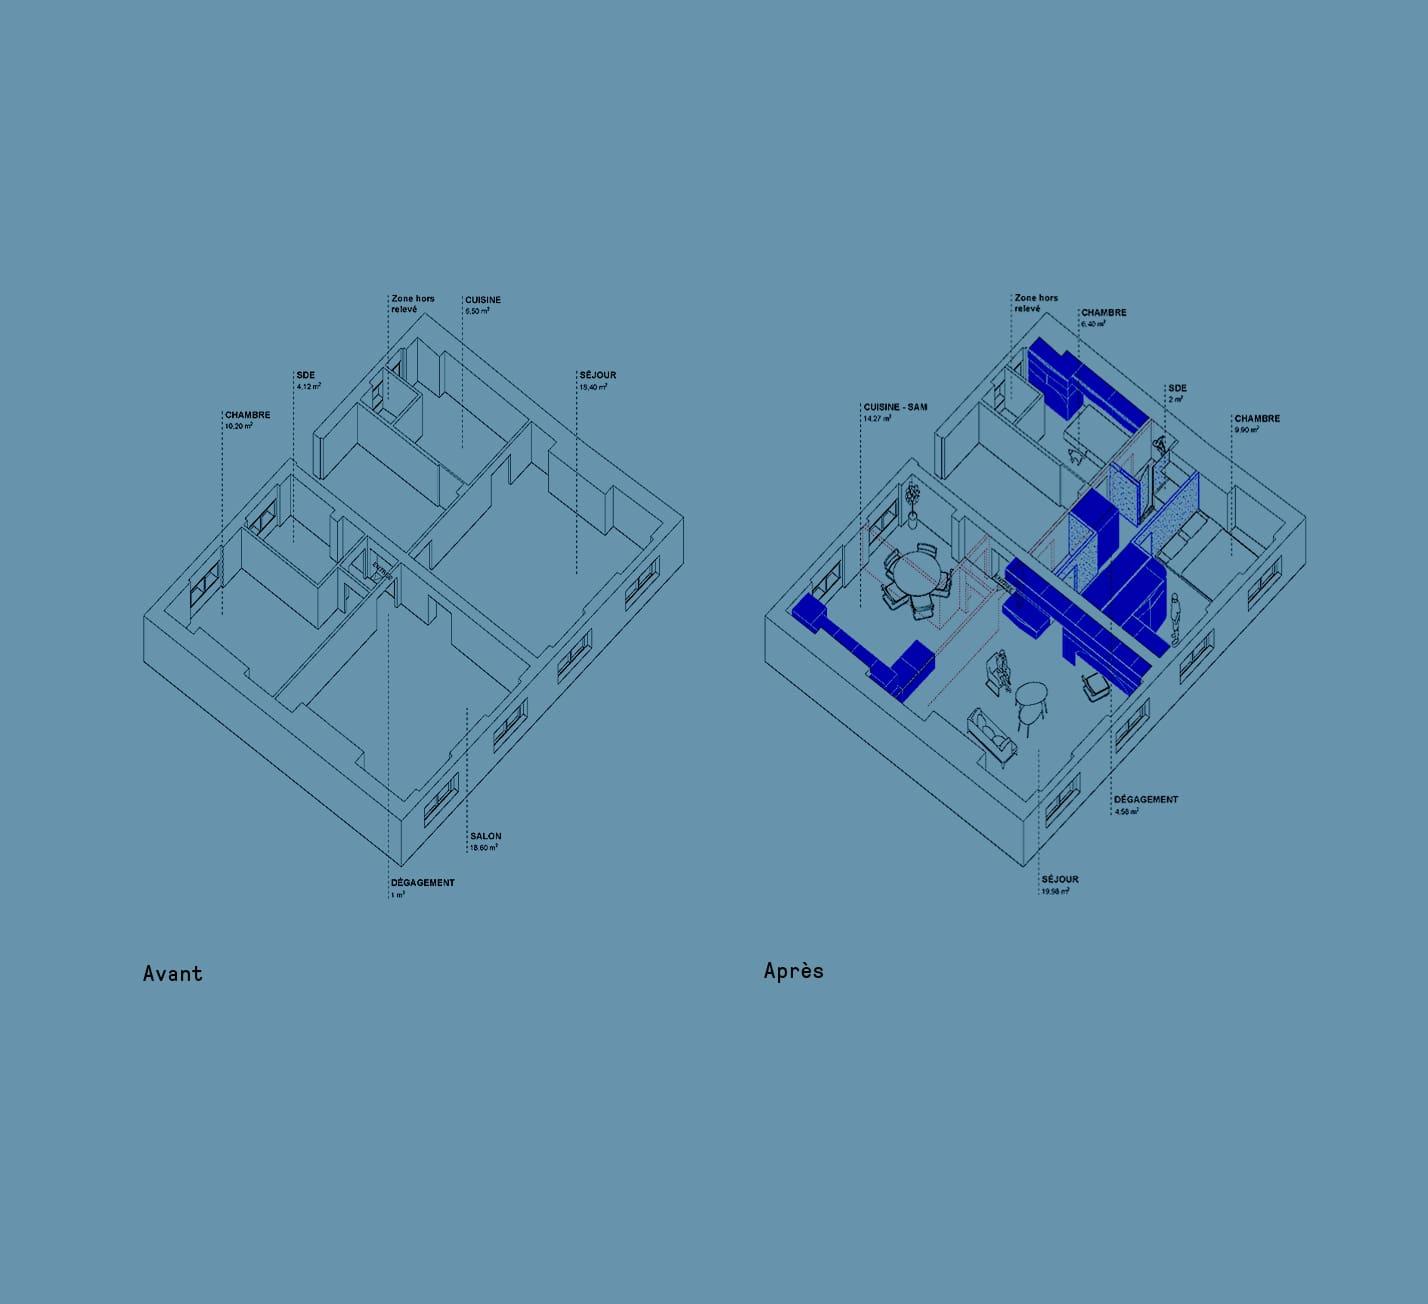 Projet-Georges-Atelier-Steve-Pauline-Borgia-Architecte-Axo-13-min